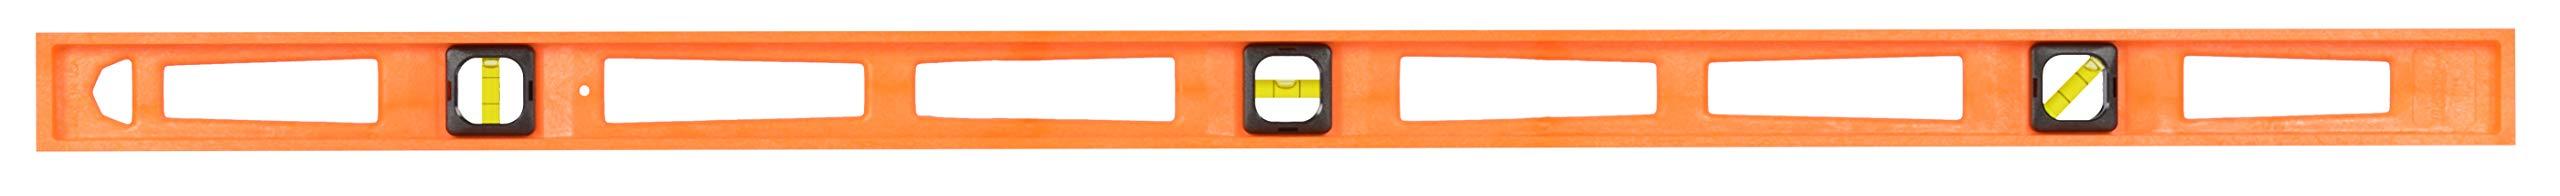 Johnson Level and Tool 7748-O 48-Inch GloOrange Structo Cast Level - 3 Vial by Johnson Level & Tool (Image #1)